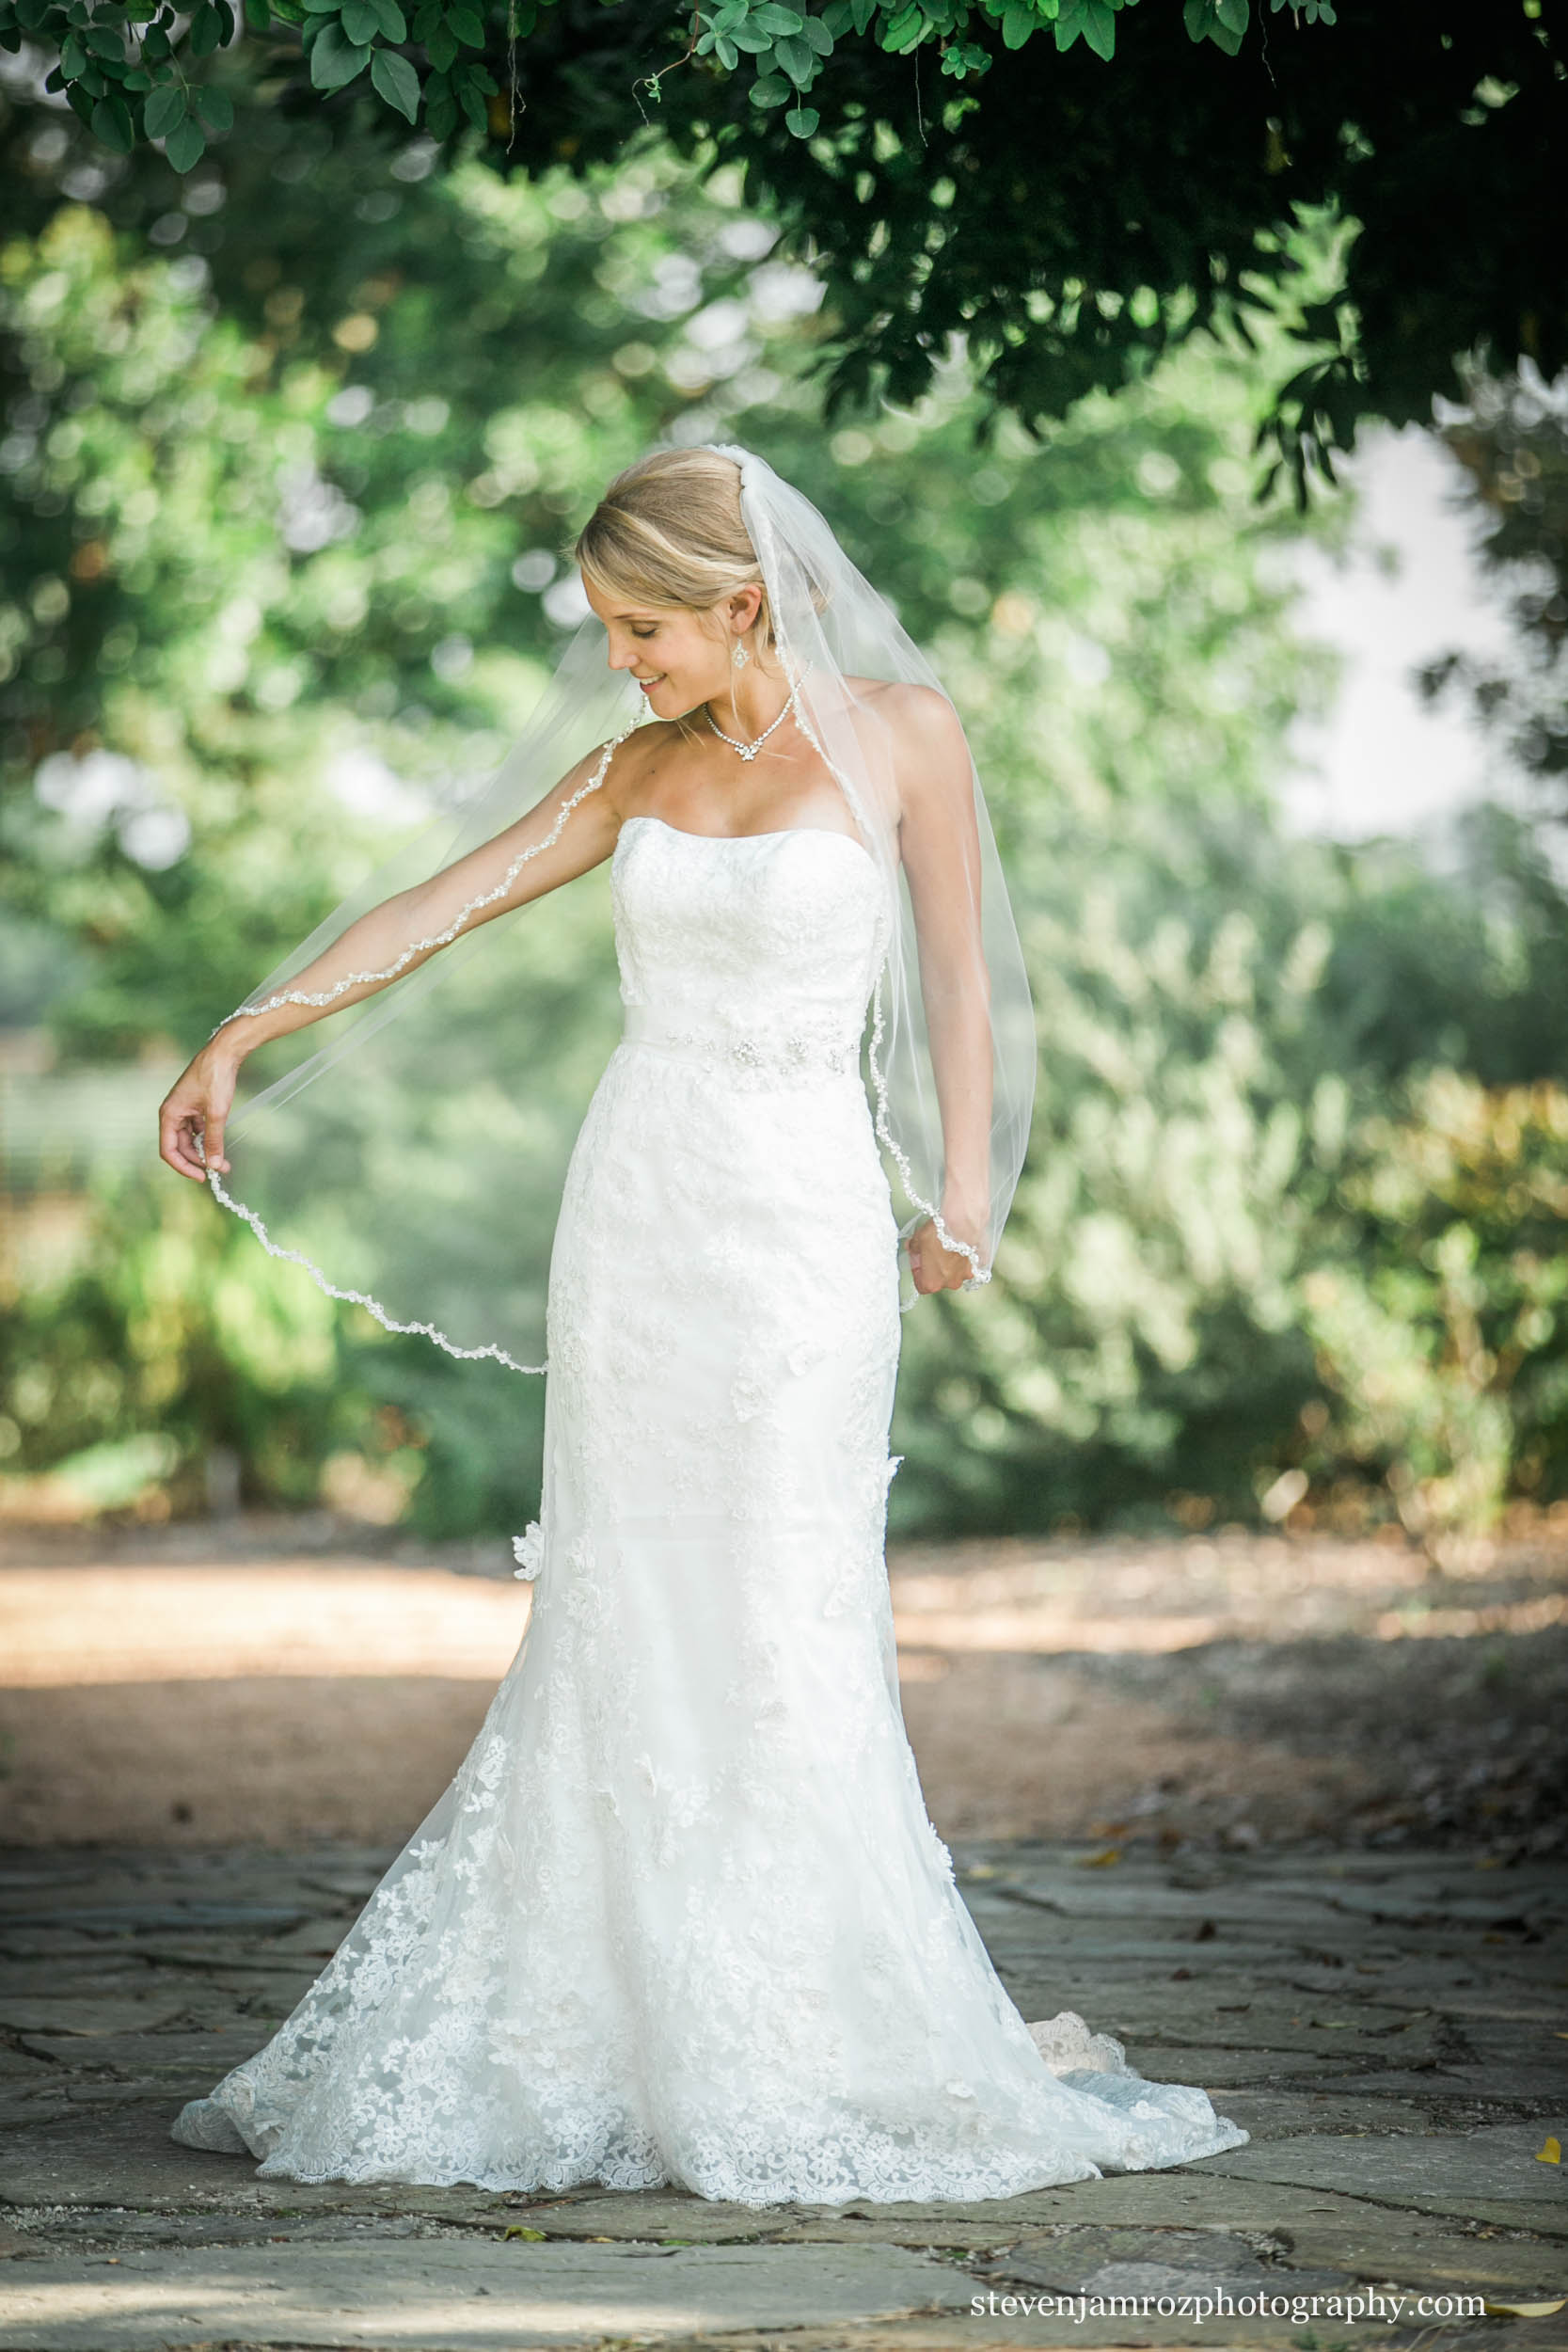 raulston-arboretum-bridal-pictures-steven-jamroz-photography-0425.jpg